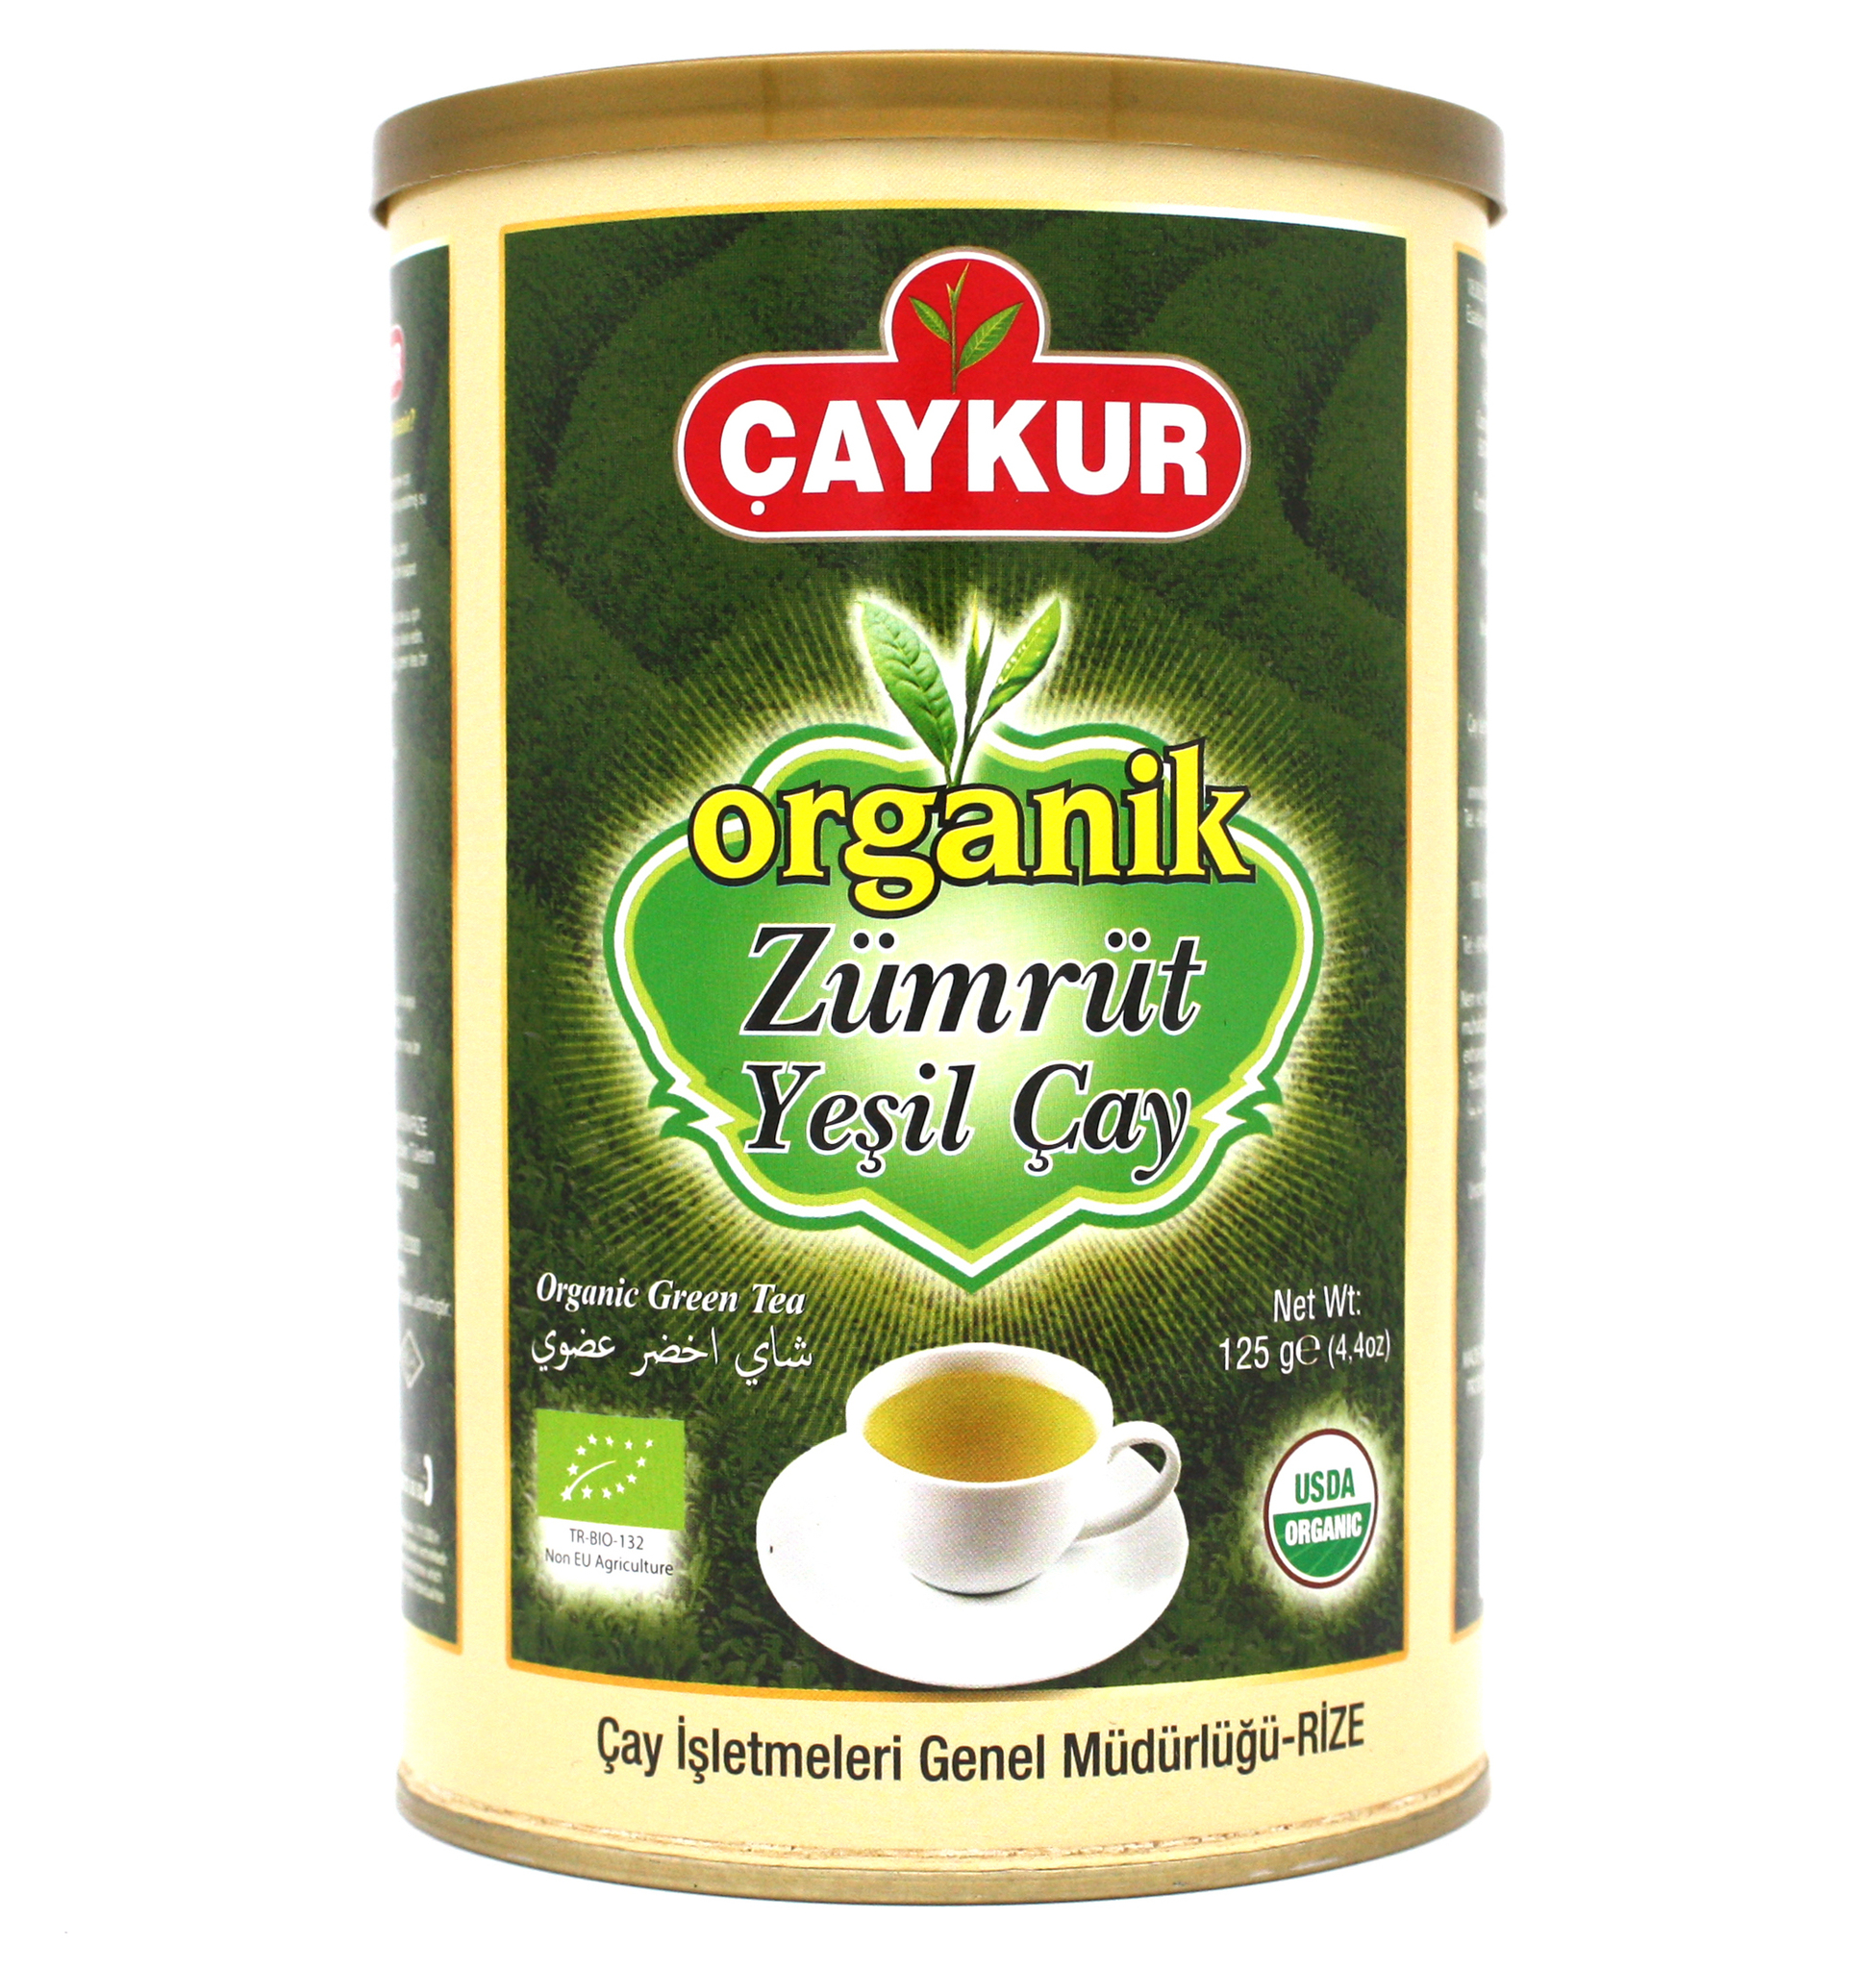 Чай Турецкий зеленый чай Organik, Çaykur, 125 г import_files_d9_d9ec986634d611e9a9a6484d7ecee297_727868f435b211e9a9a6484d7ecee297.jpg